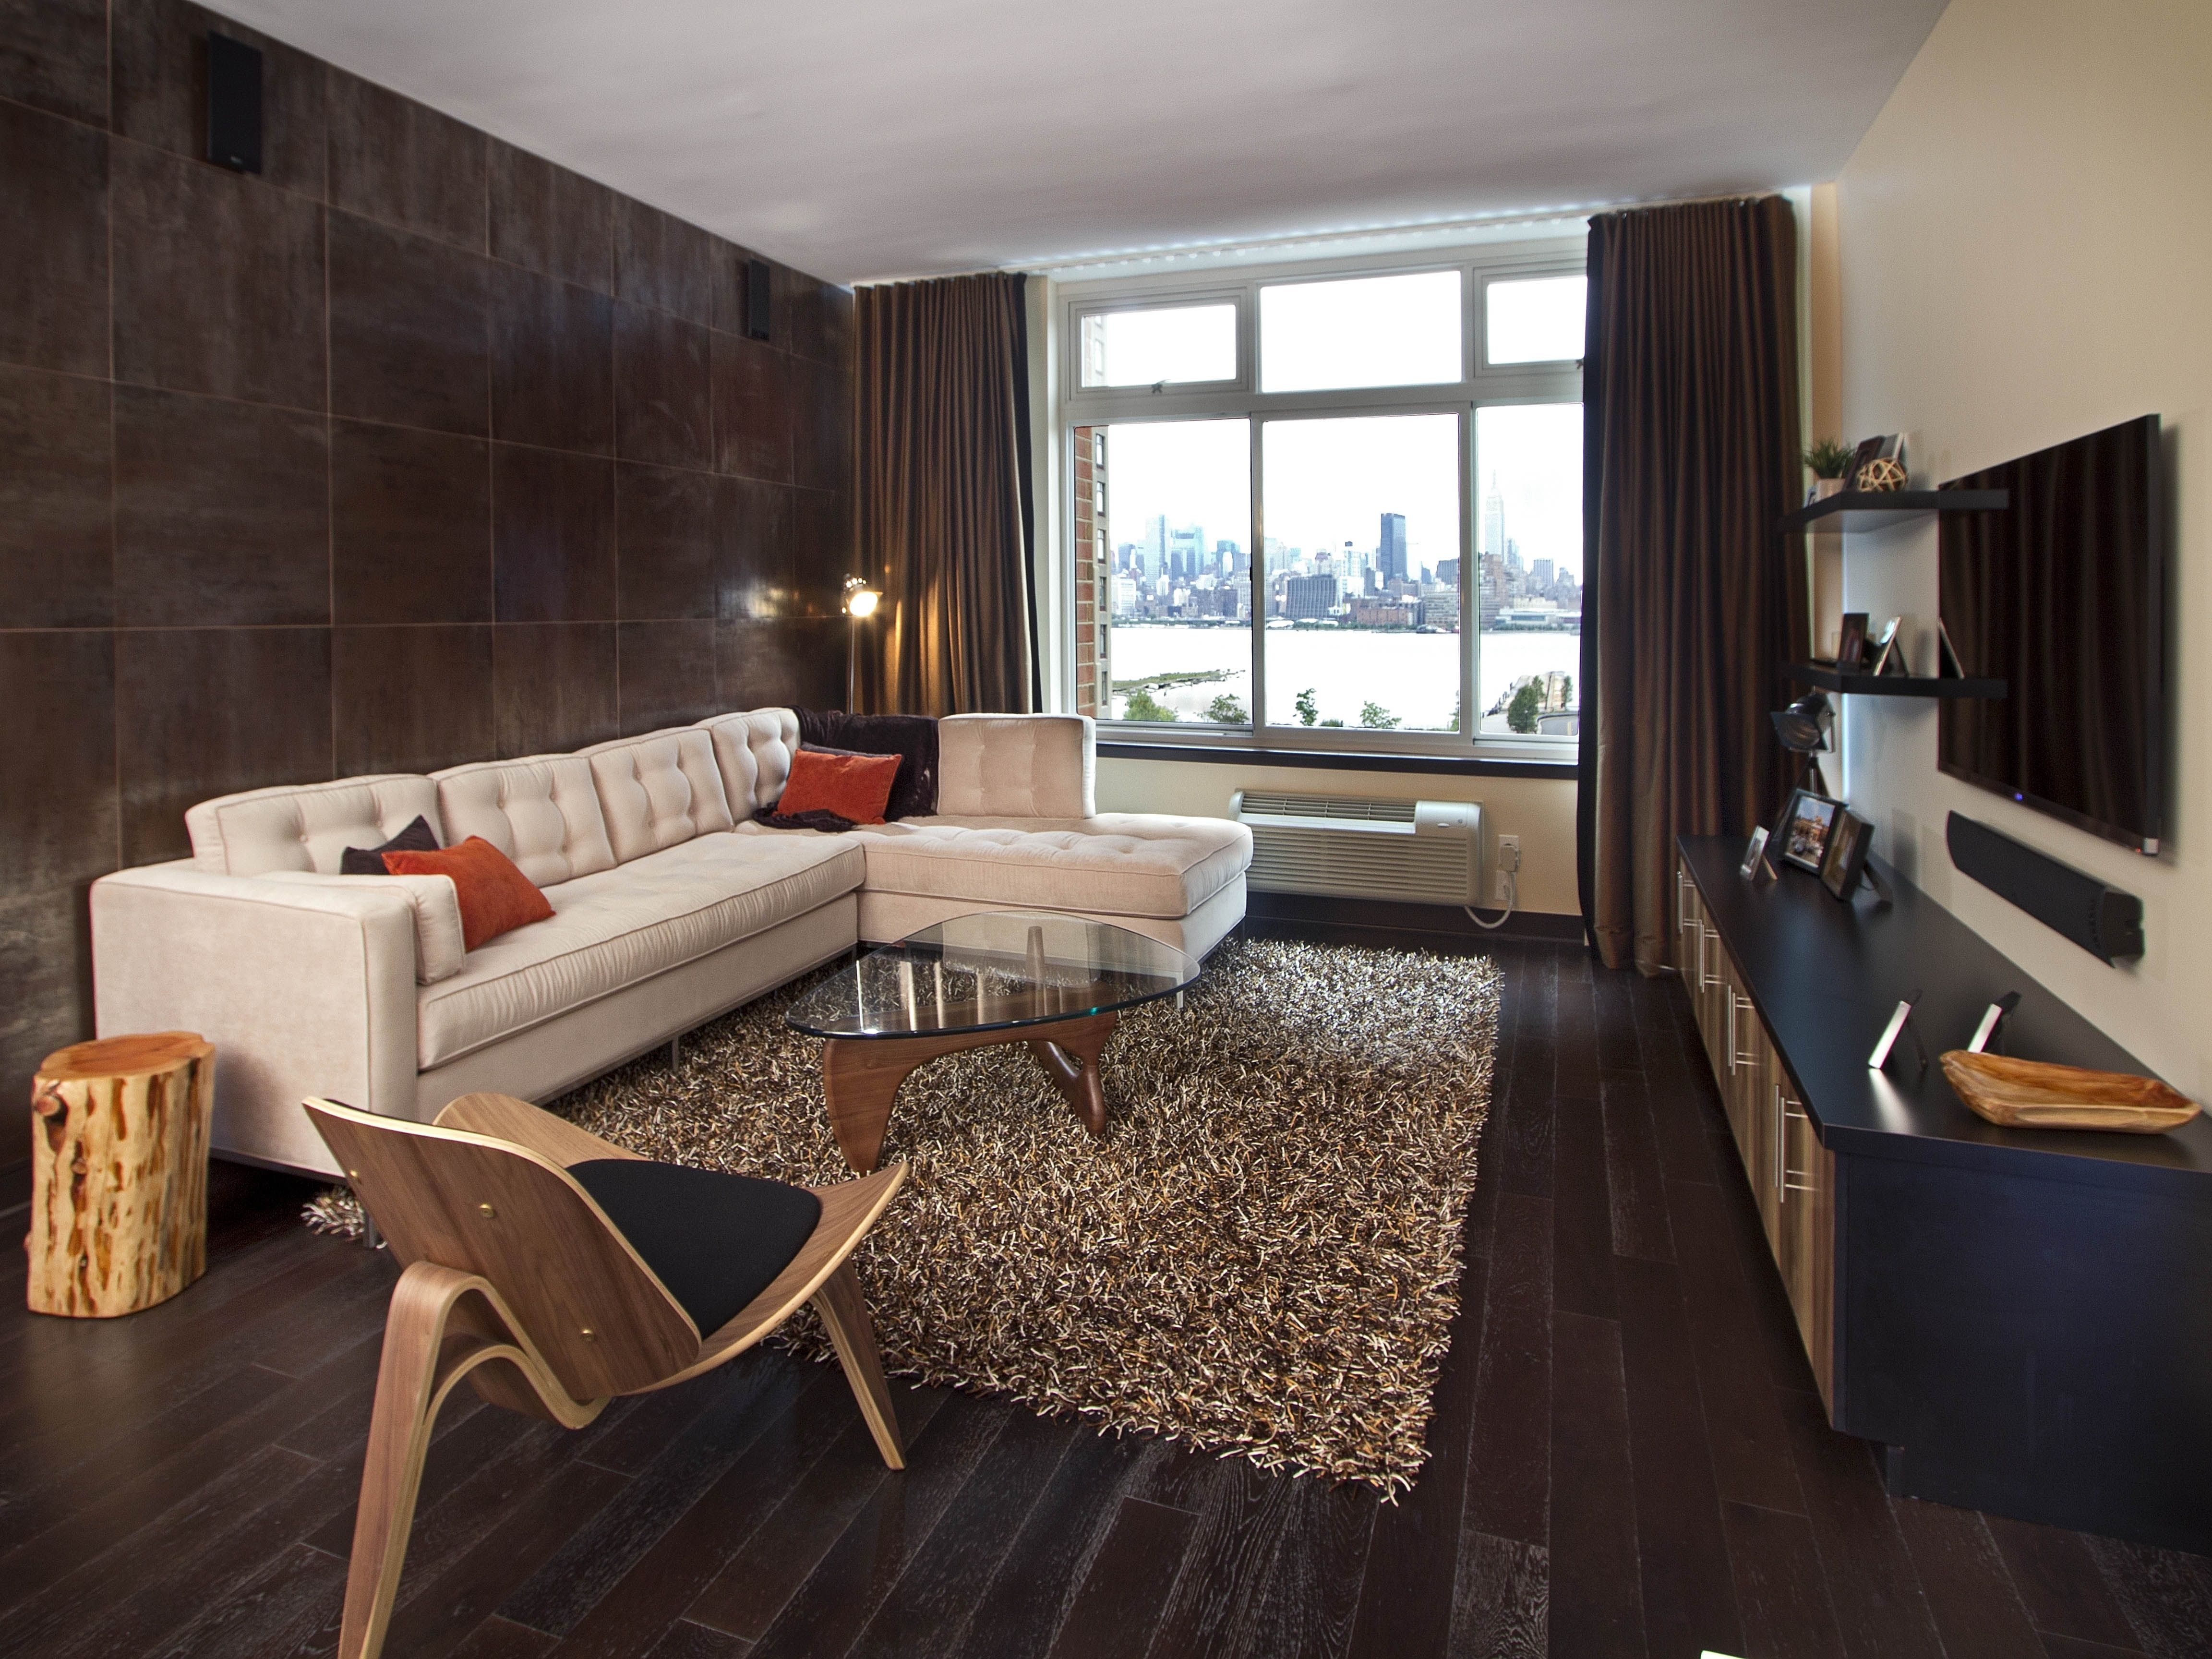 Cool Modern Rustic Living Room Ideas Elegant